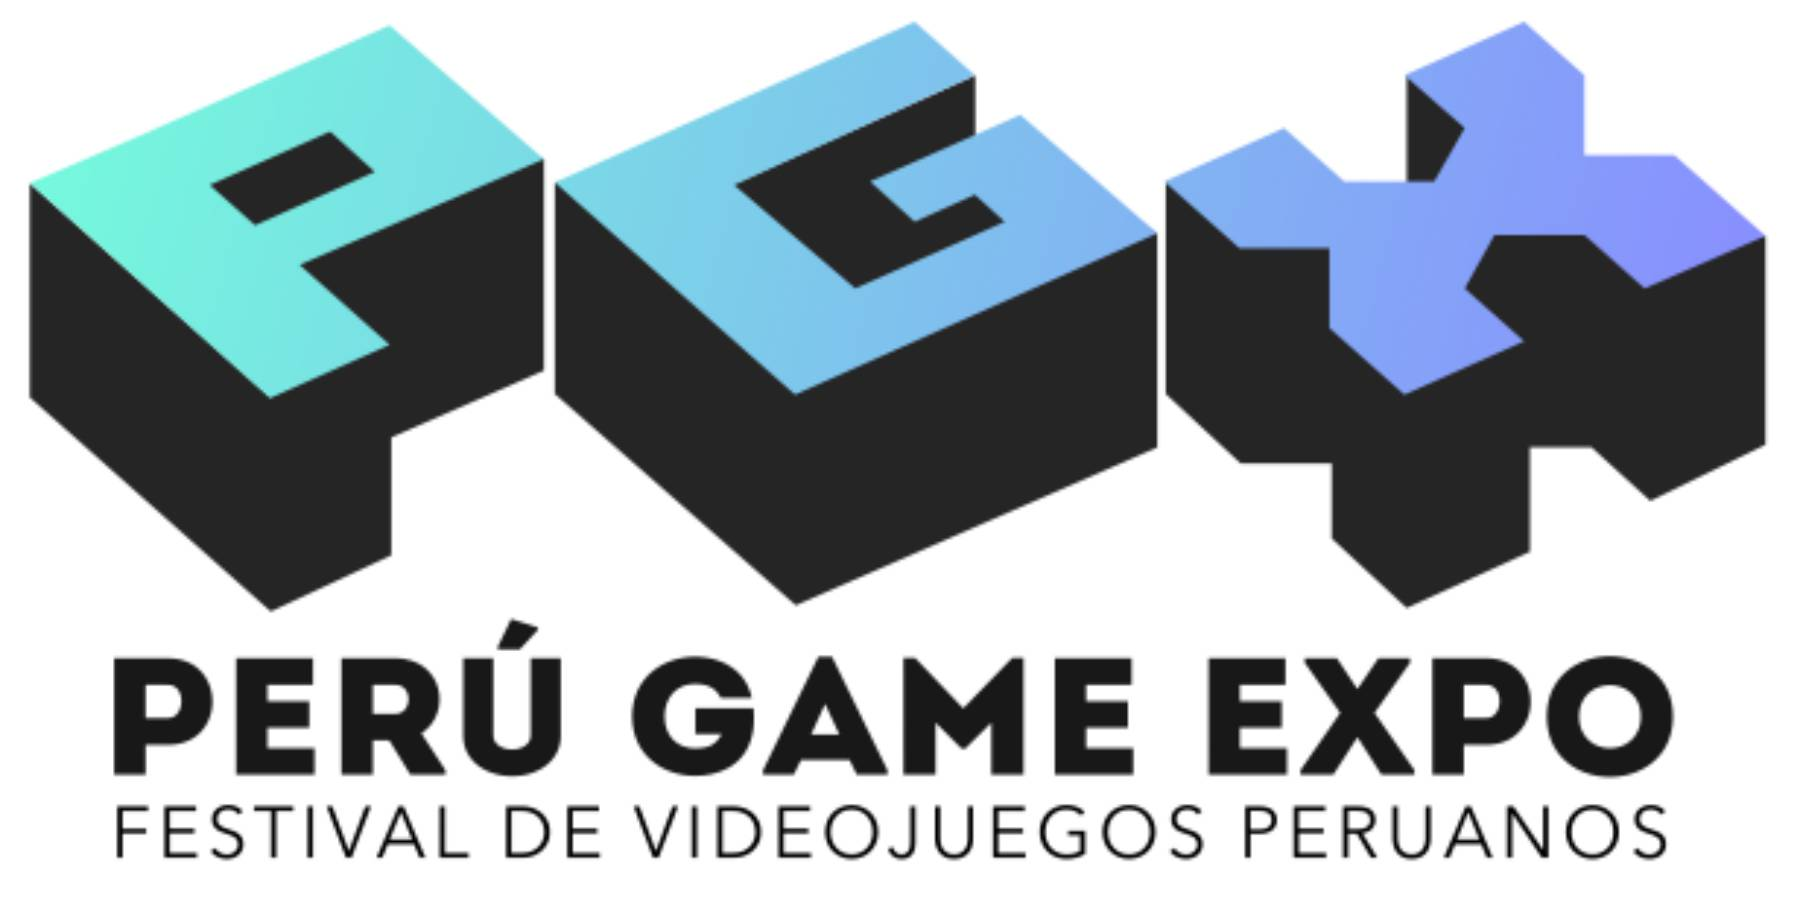 Festival de Videojuegos Peruanos – PGX